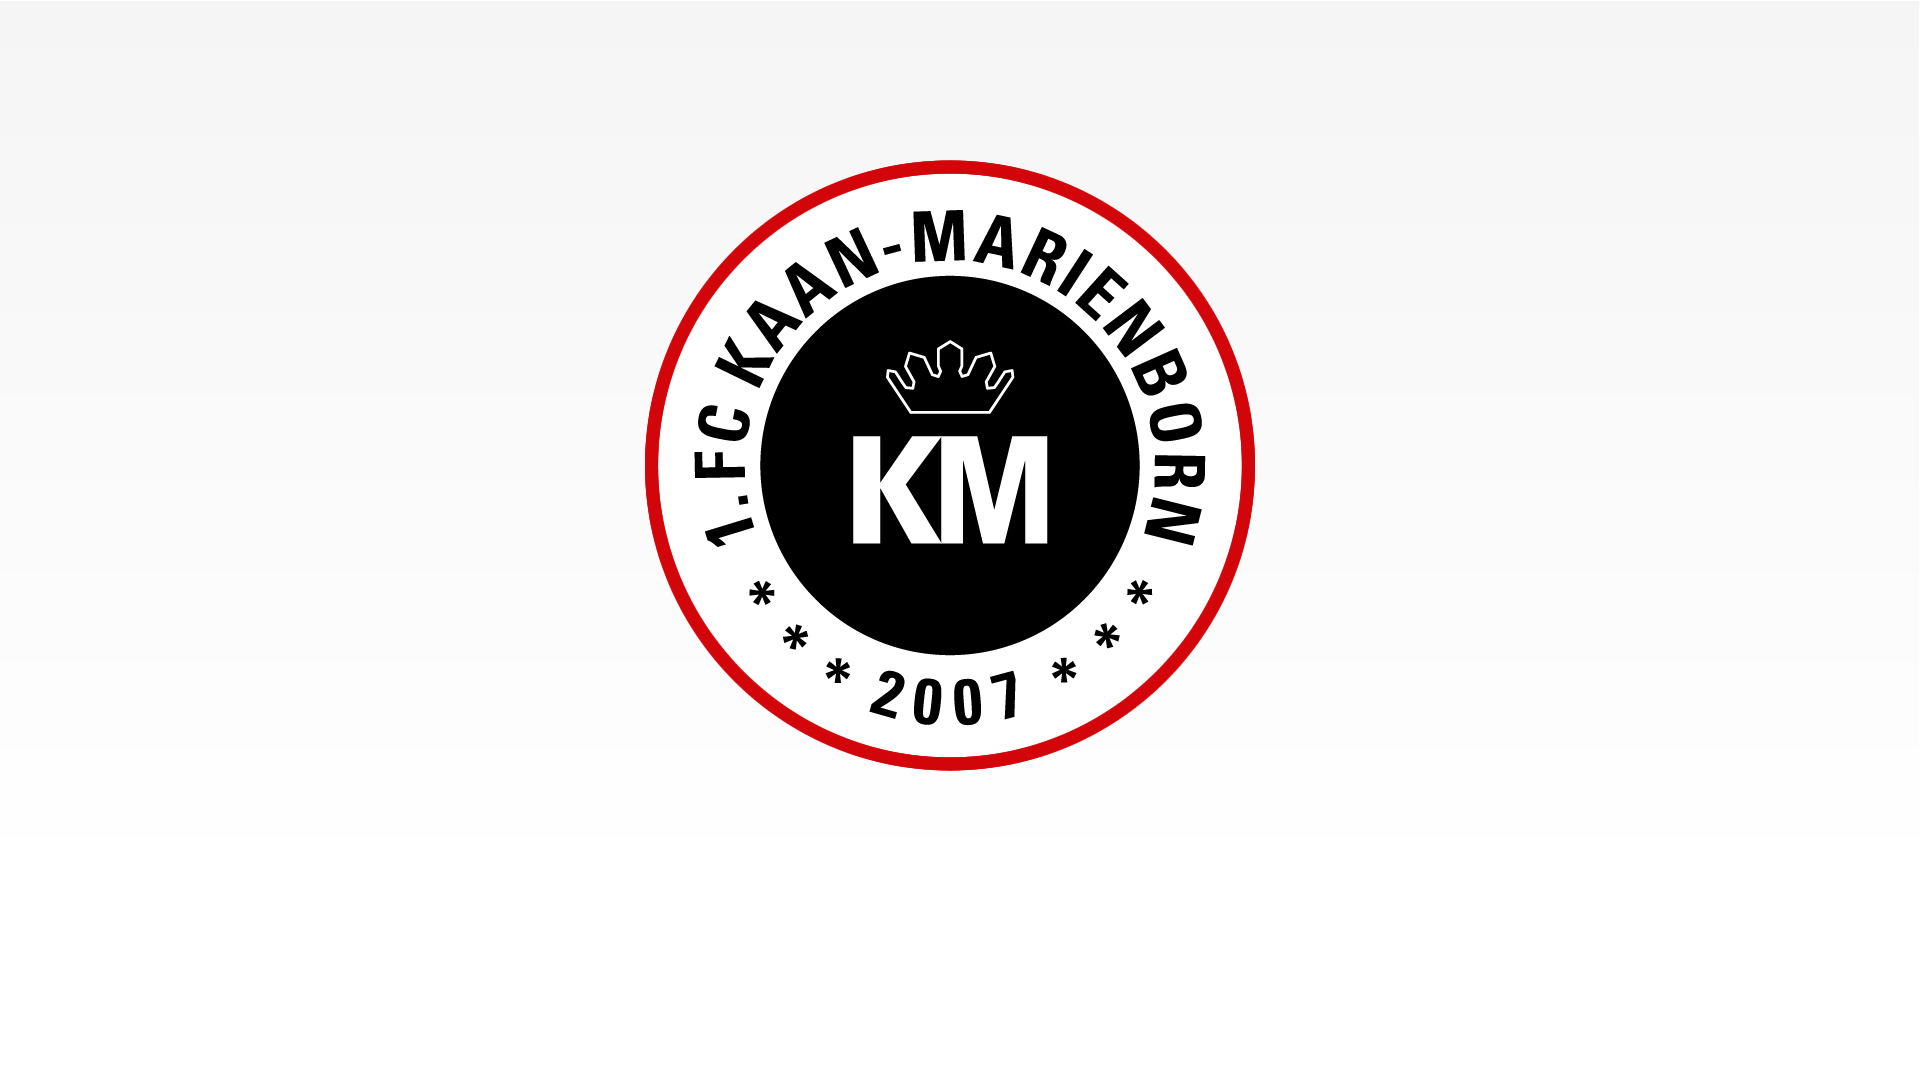 1 Fc Kaan Marienborn 07 Ev Der Siegerländer Weg